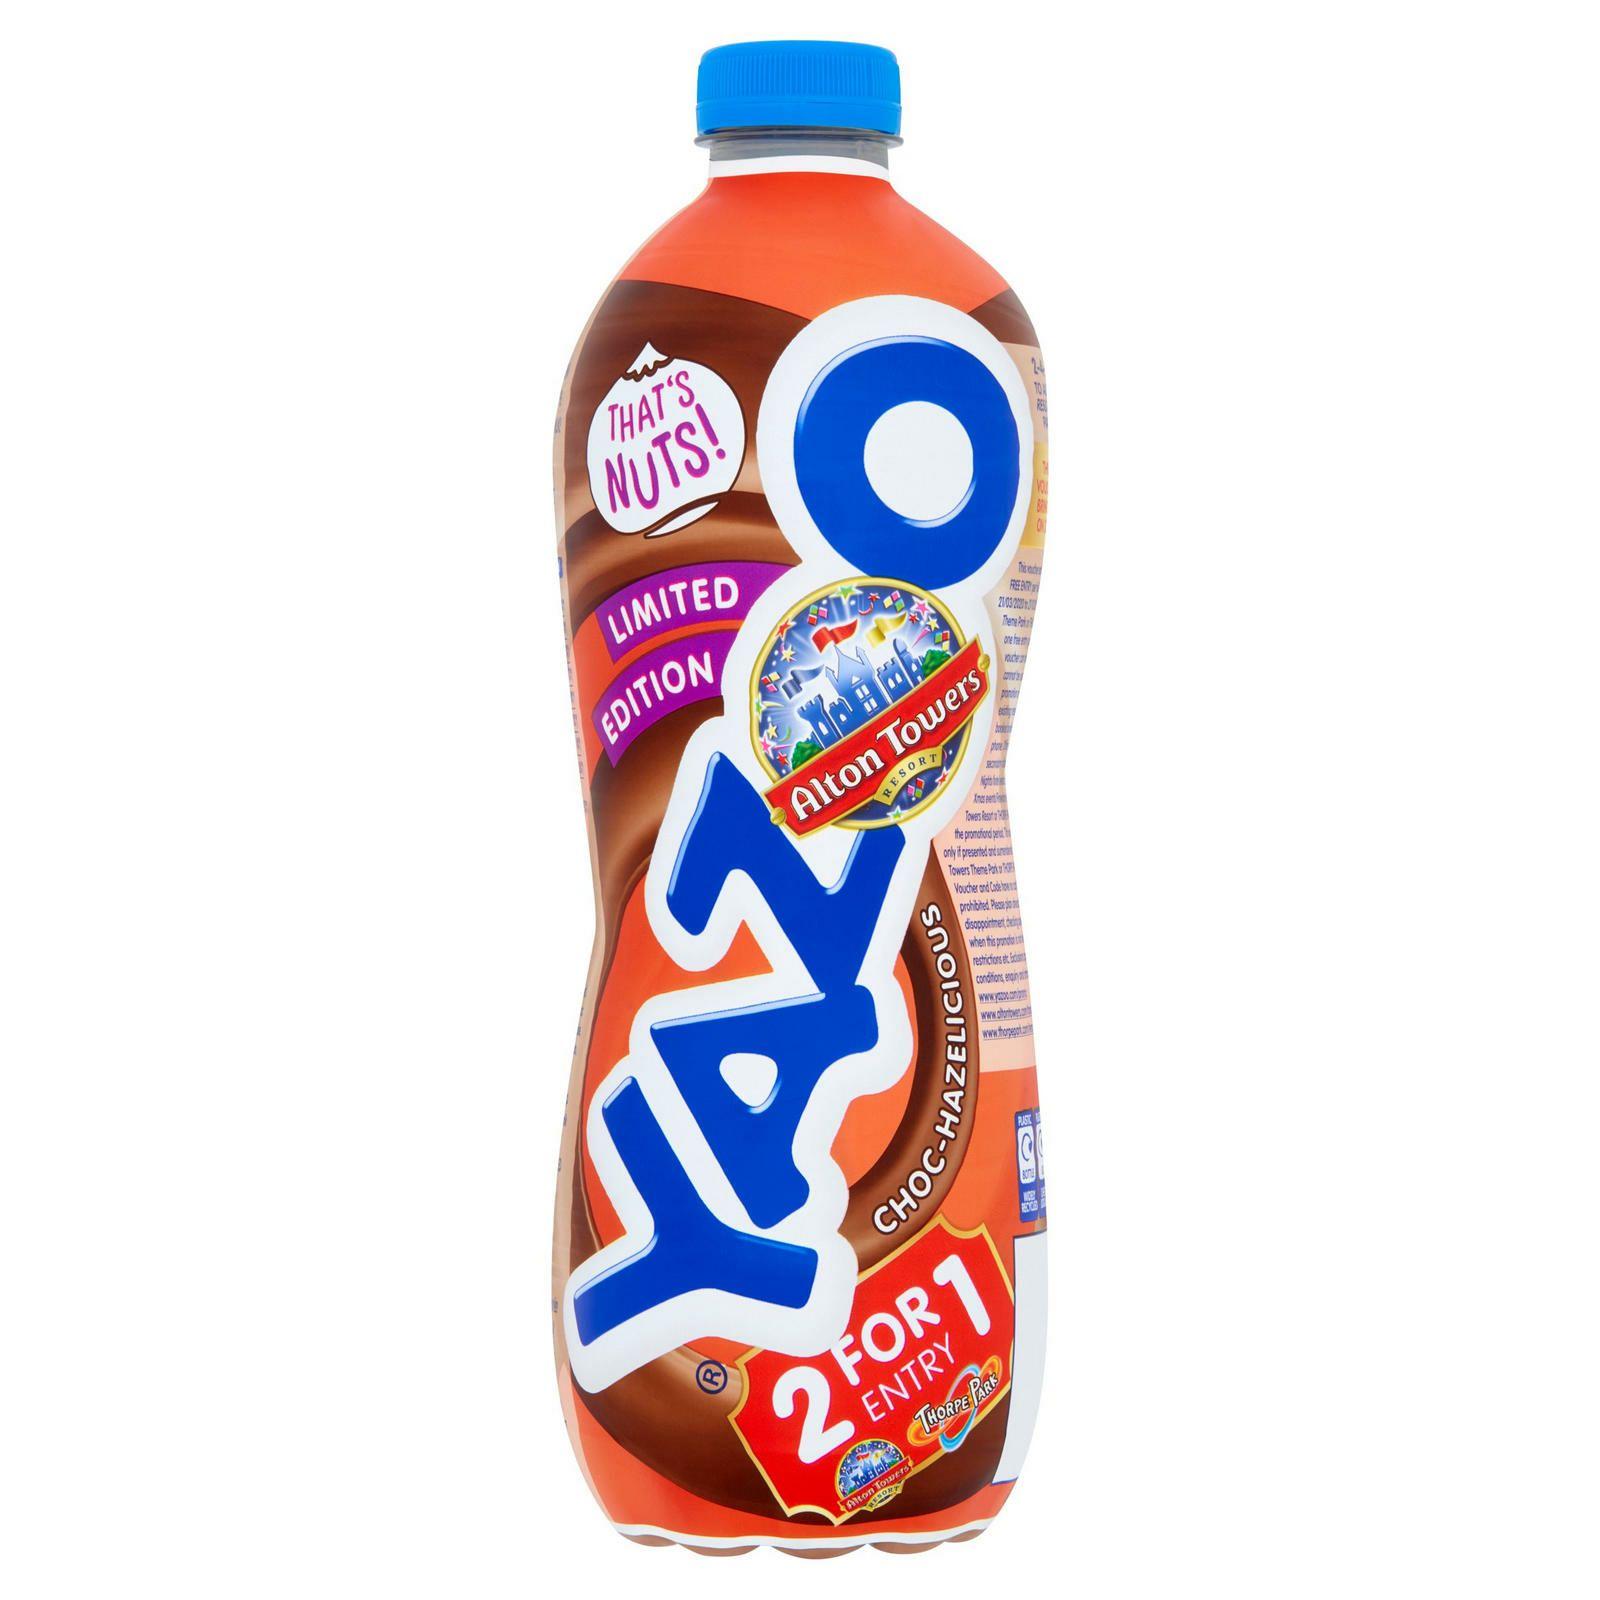 Yazoo 1l milkshakes various flavours £1.10 @ Iceland